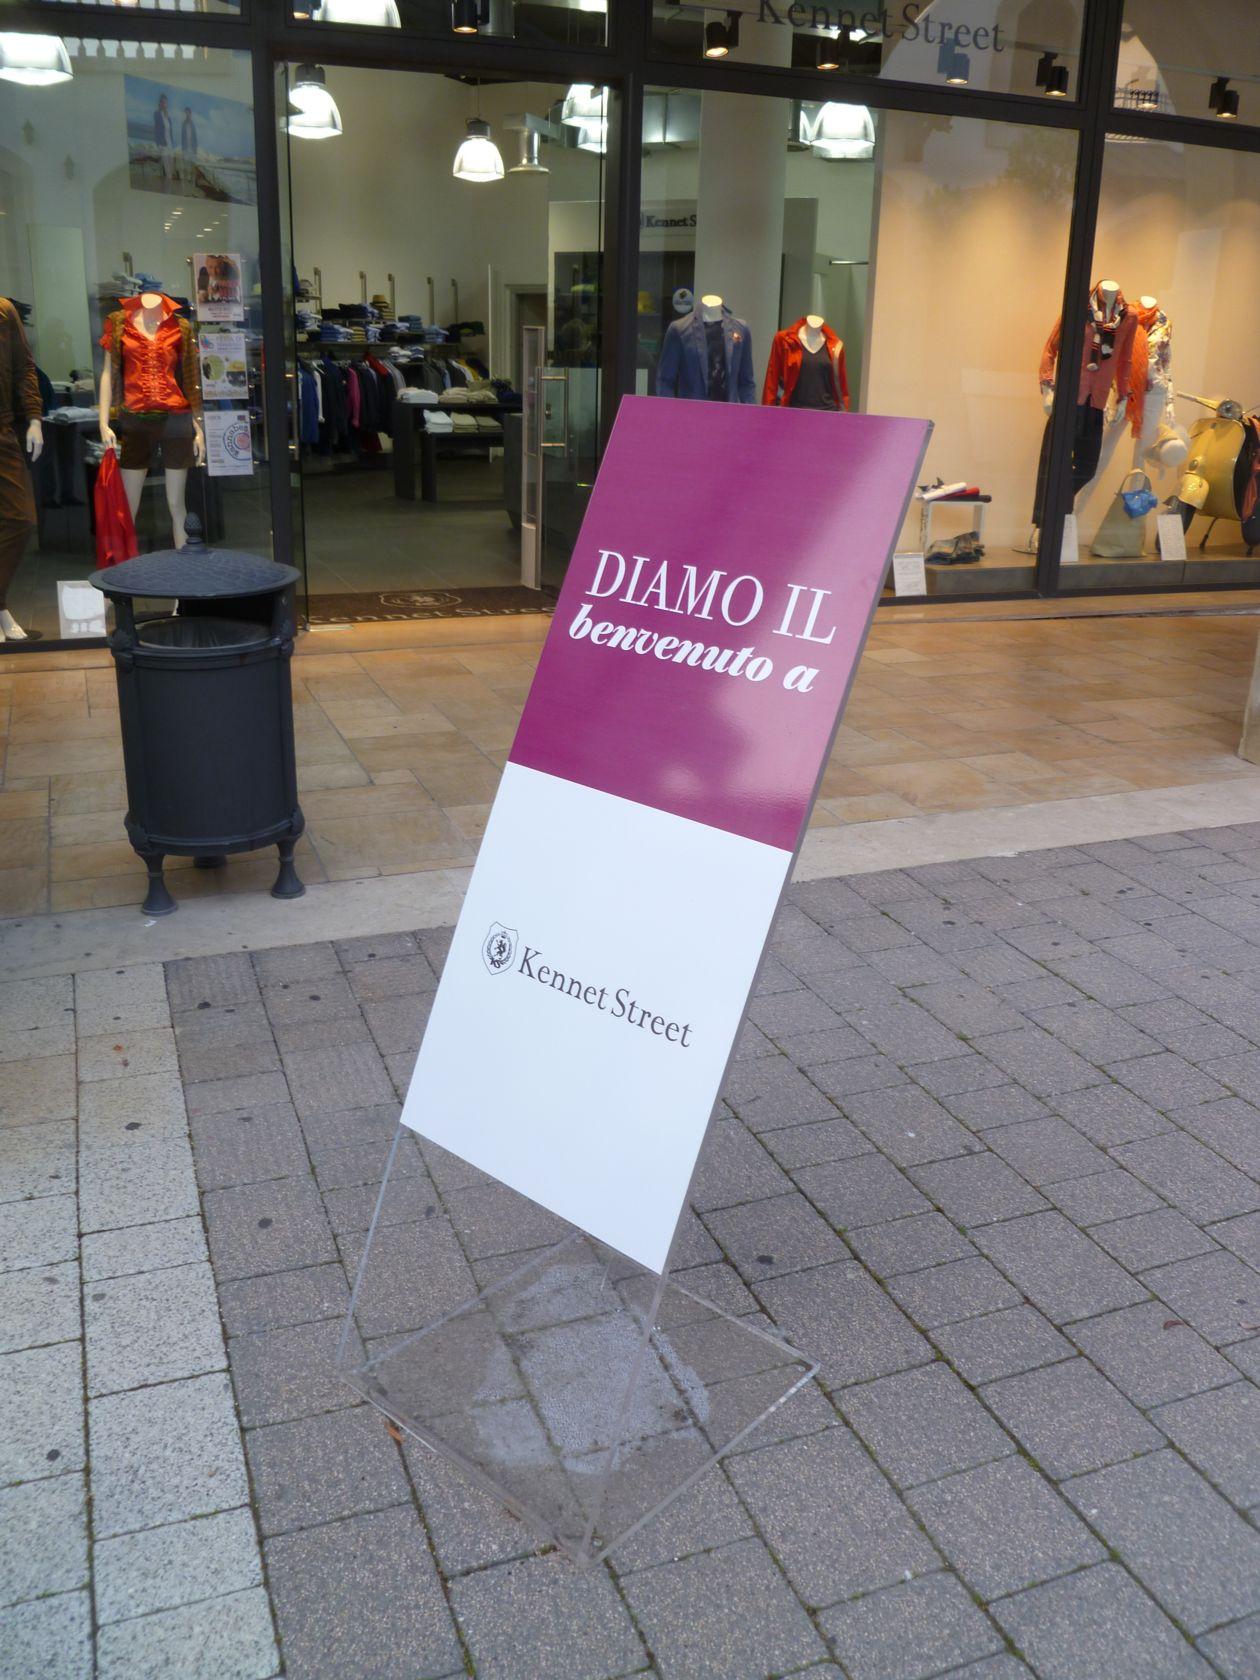 2013-06 FashionDistrict Molfetta Expo-Plex 001